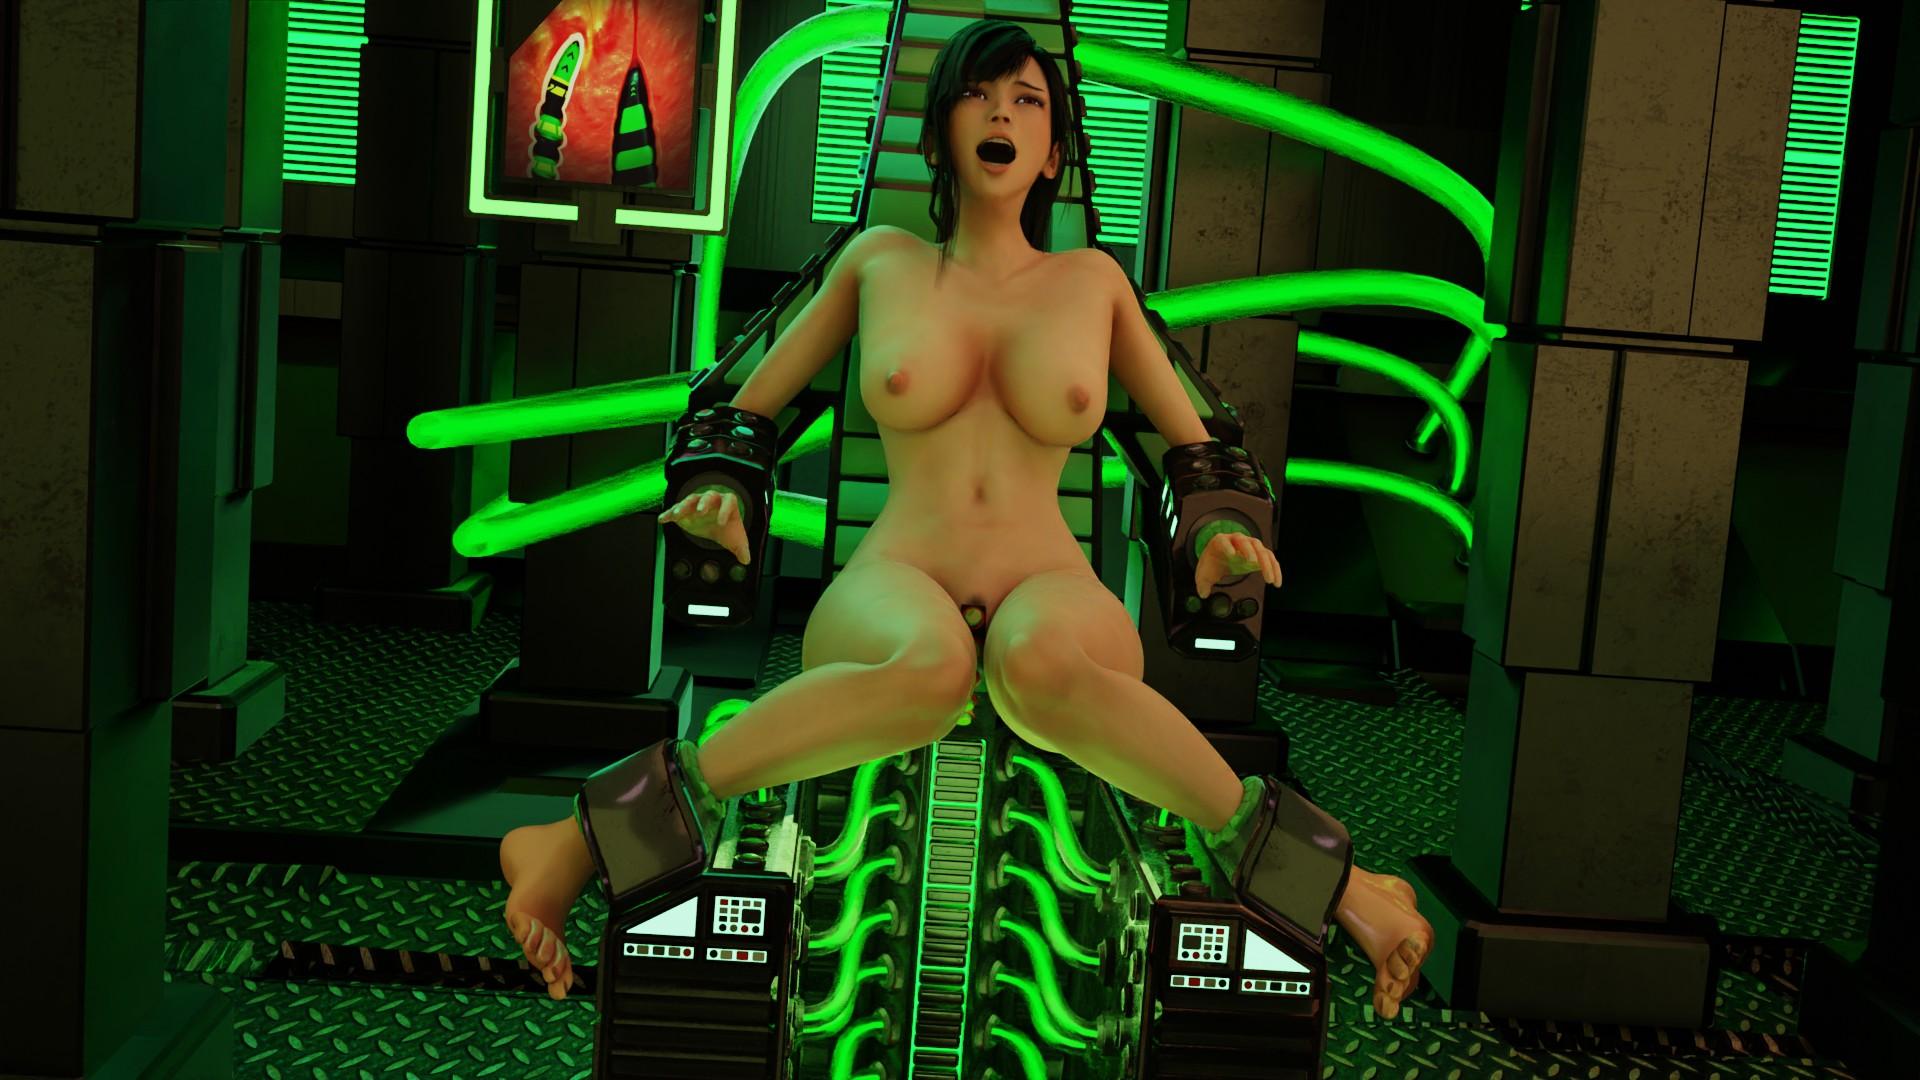 Tifa's New Intense Training Regiment [Unity Experience] VRAnimeTed vr porn game vrporn.com virtual reality